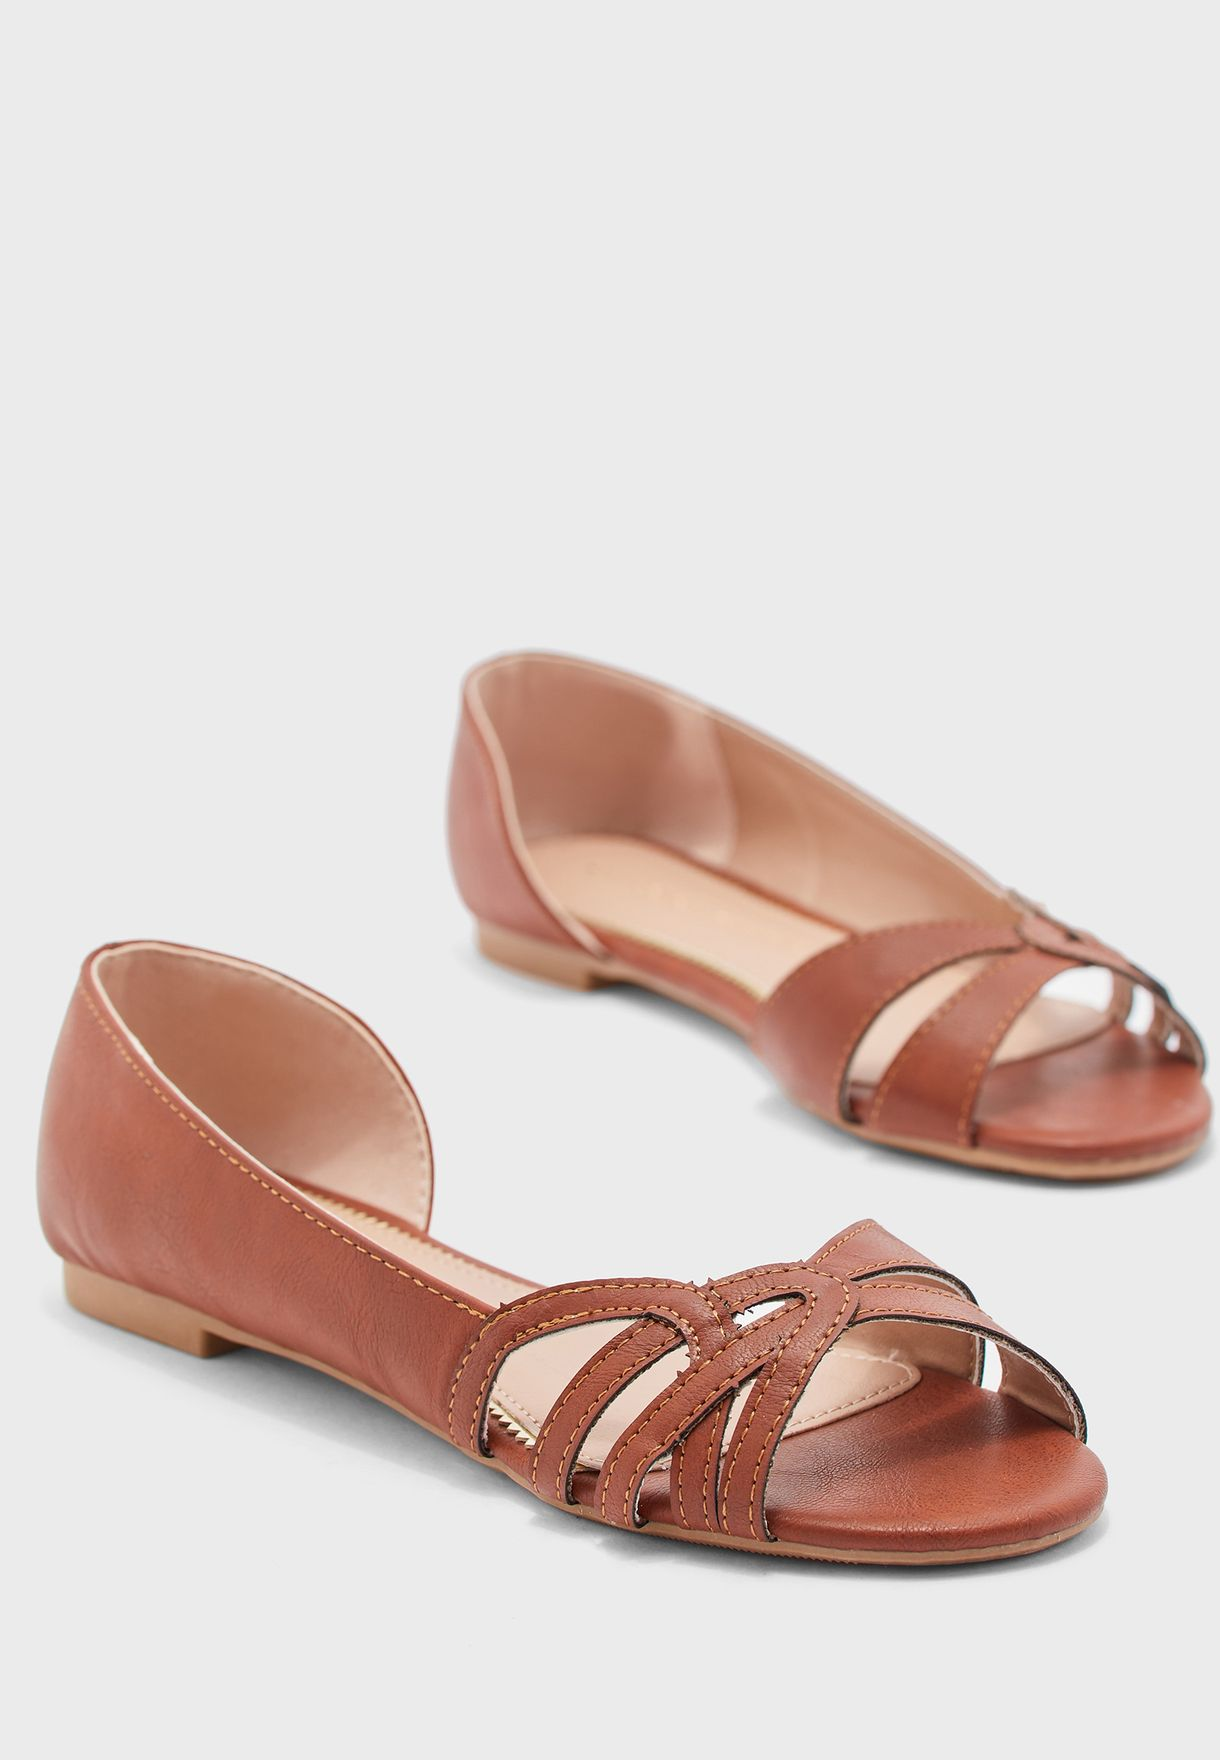 Patrice D'Orsay Flat Sandal